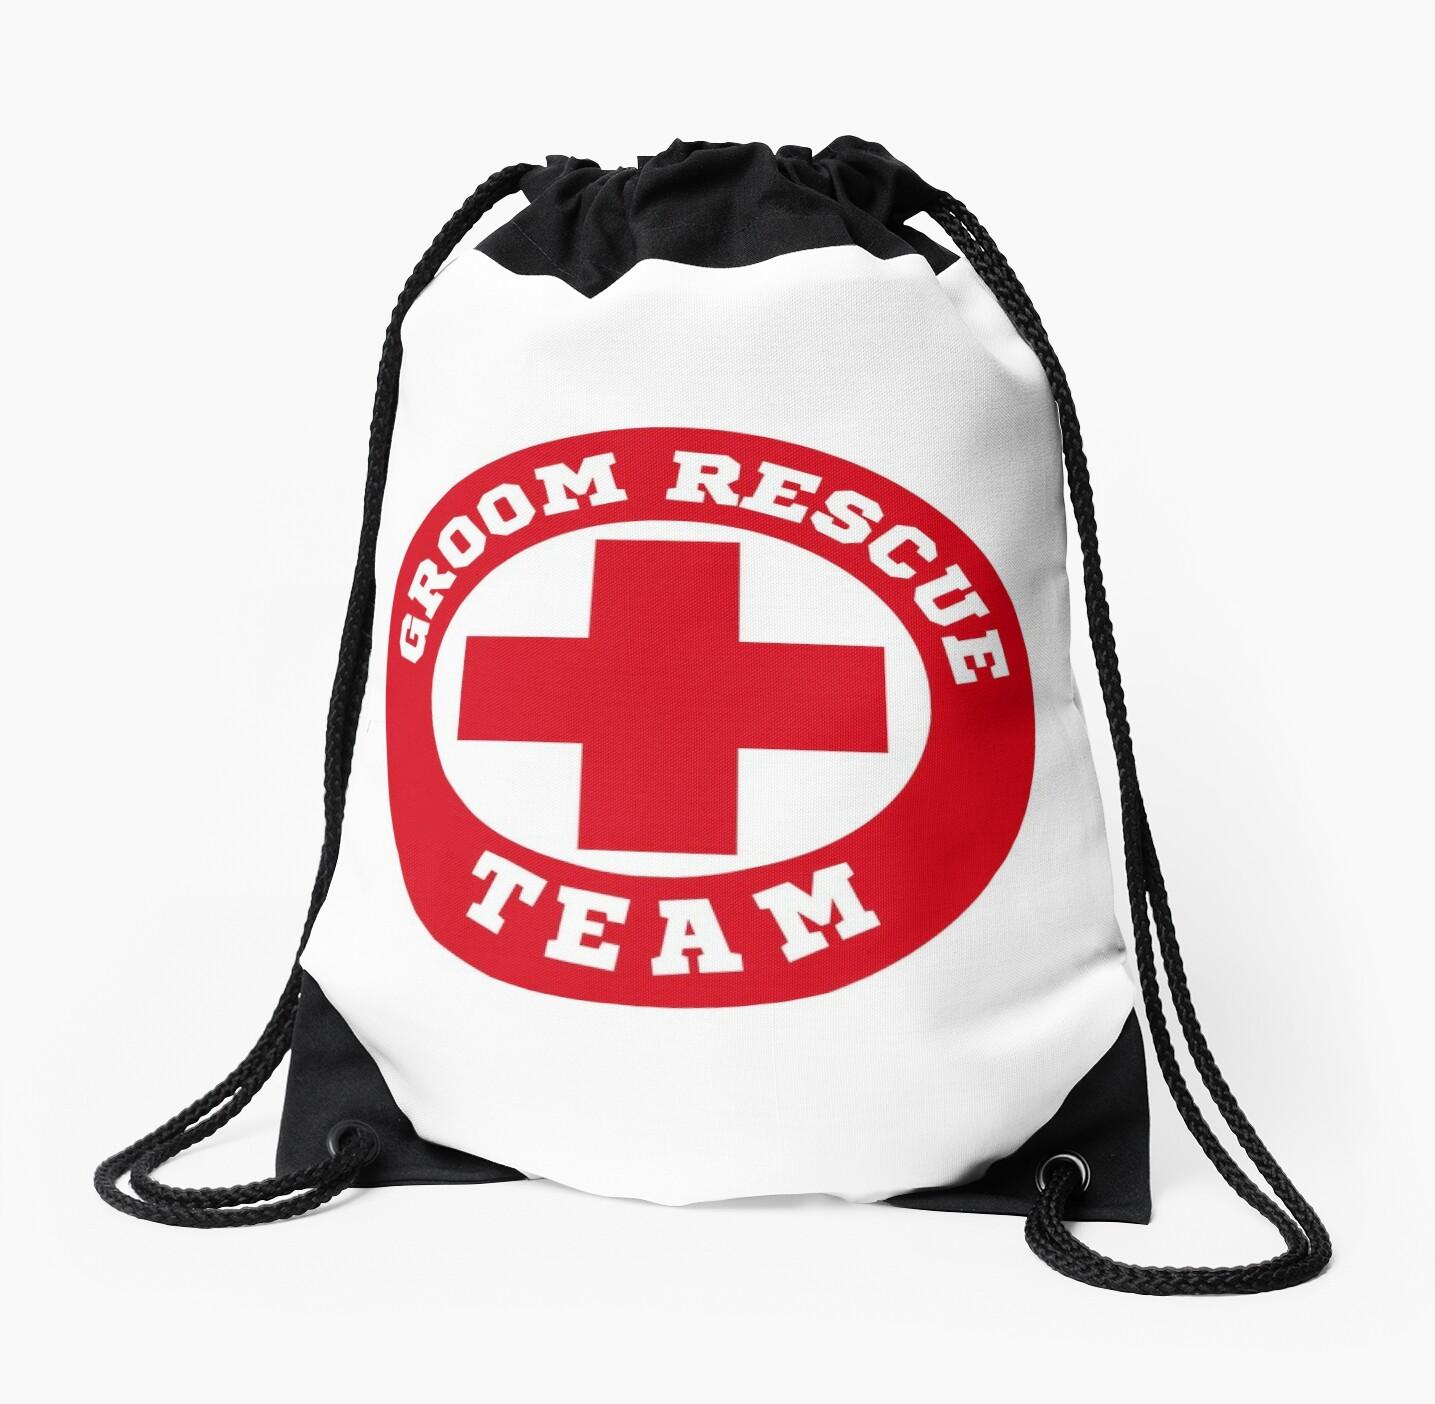 Groom Rescue Team V4  by TeeTimeGuys